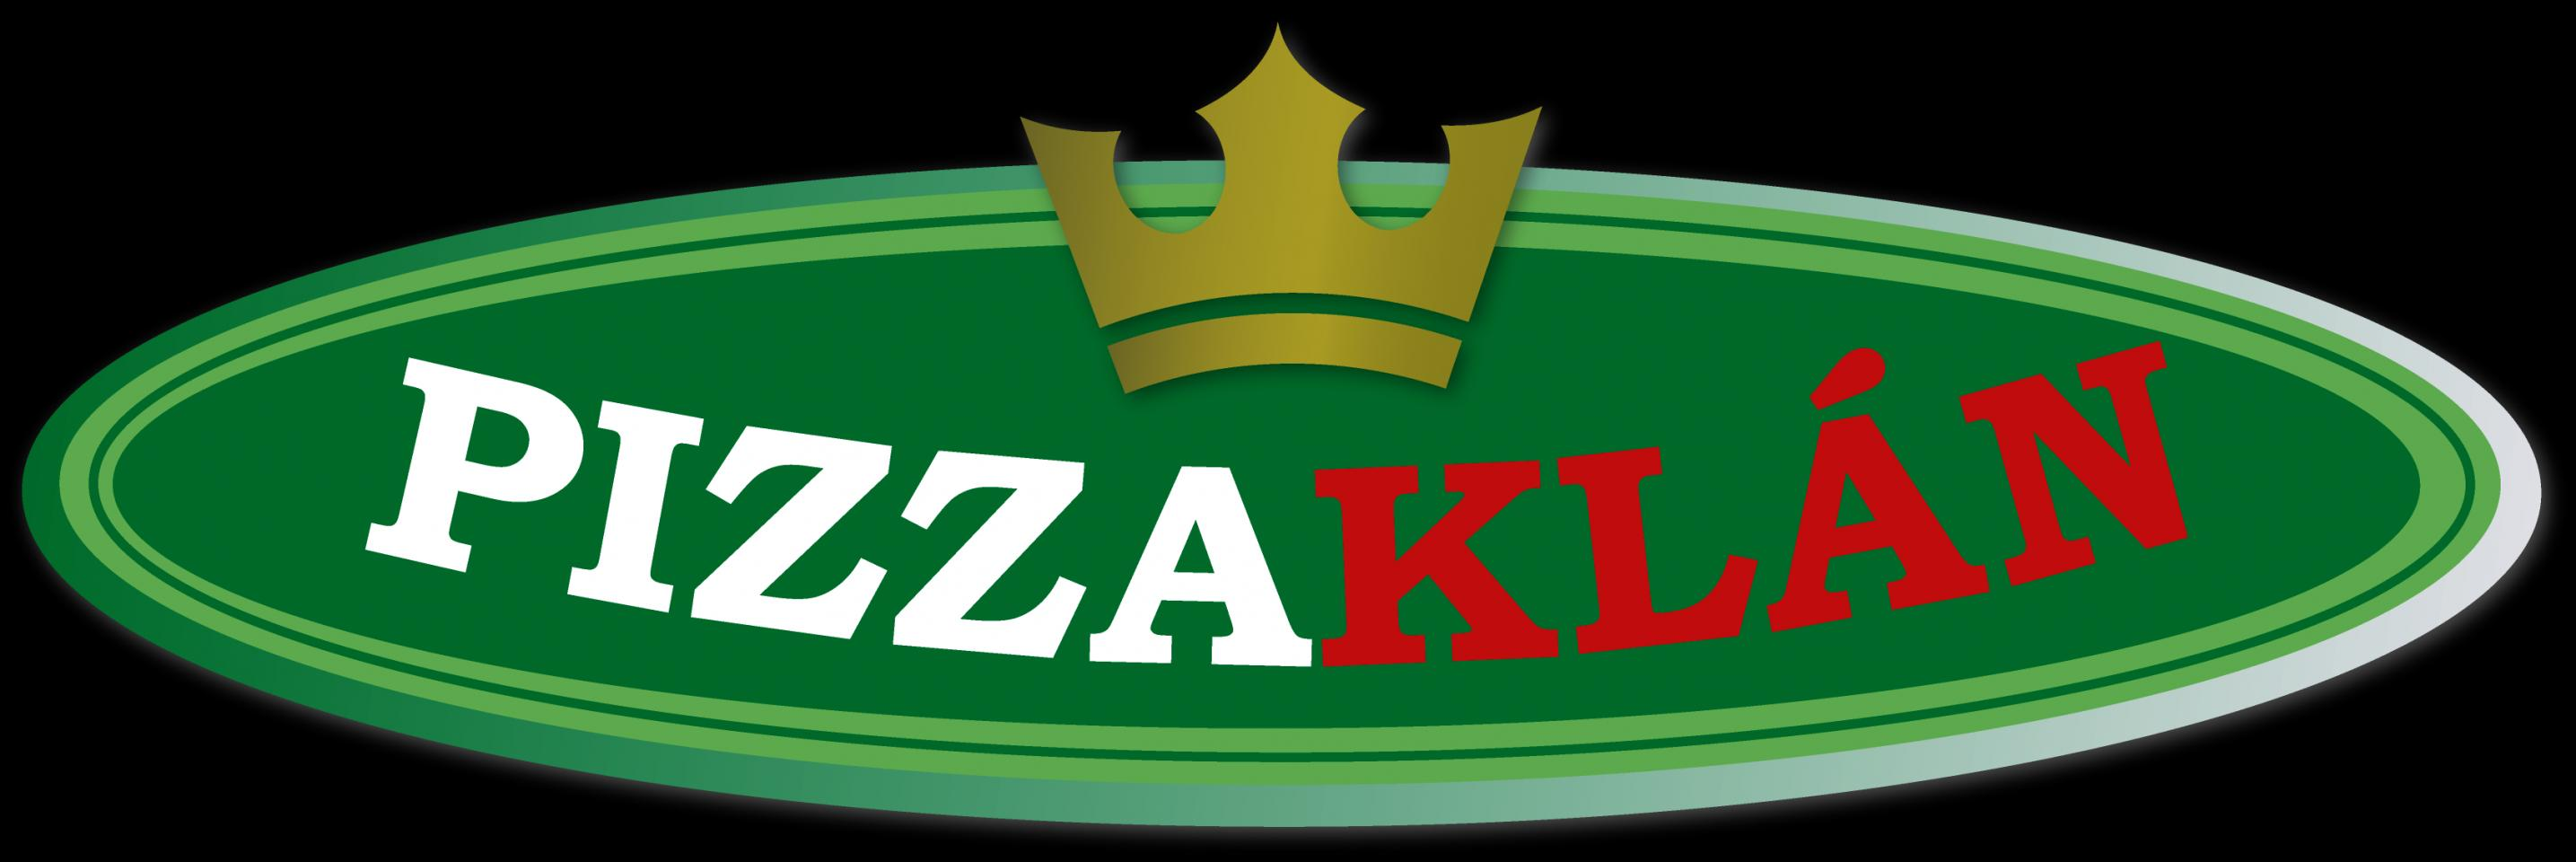 Pizza Klán